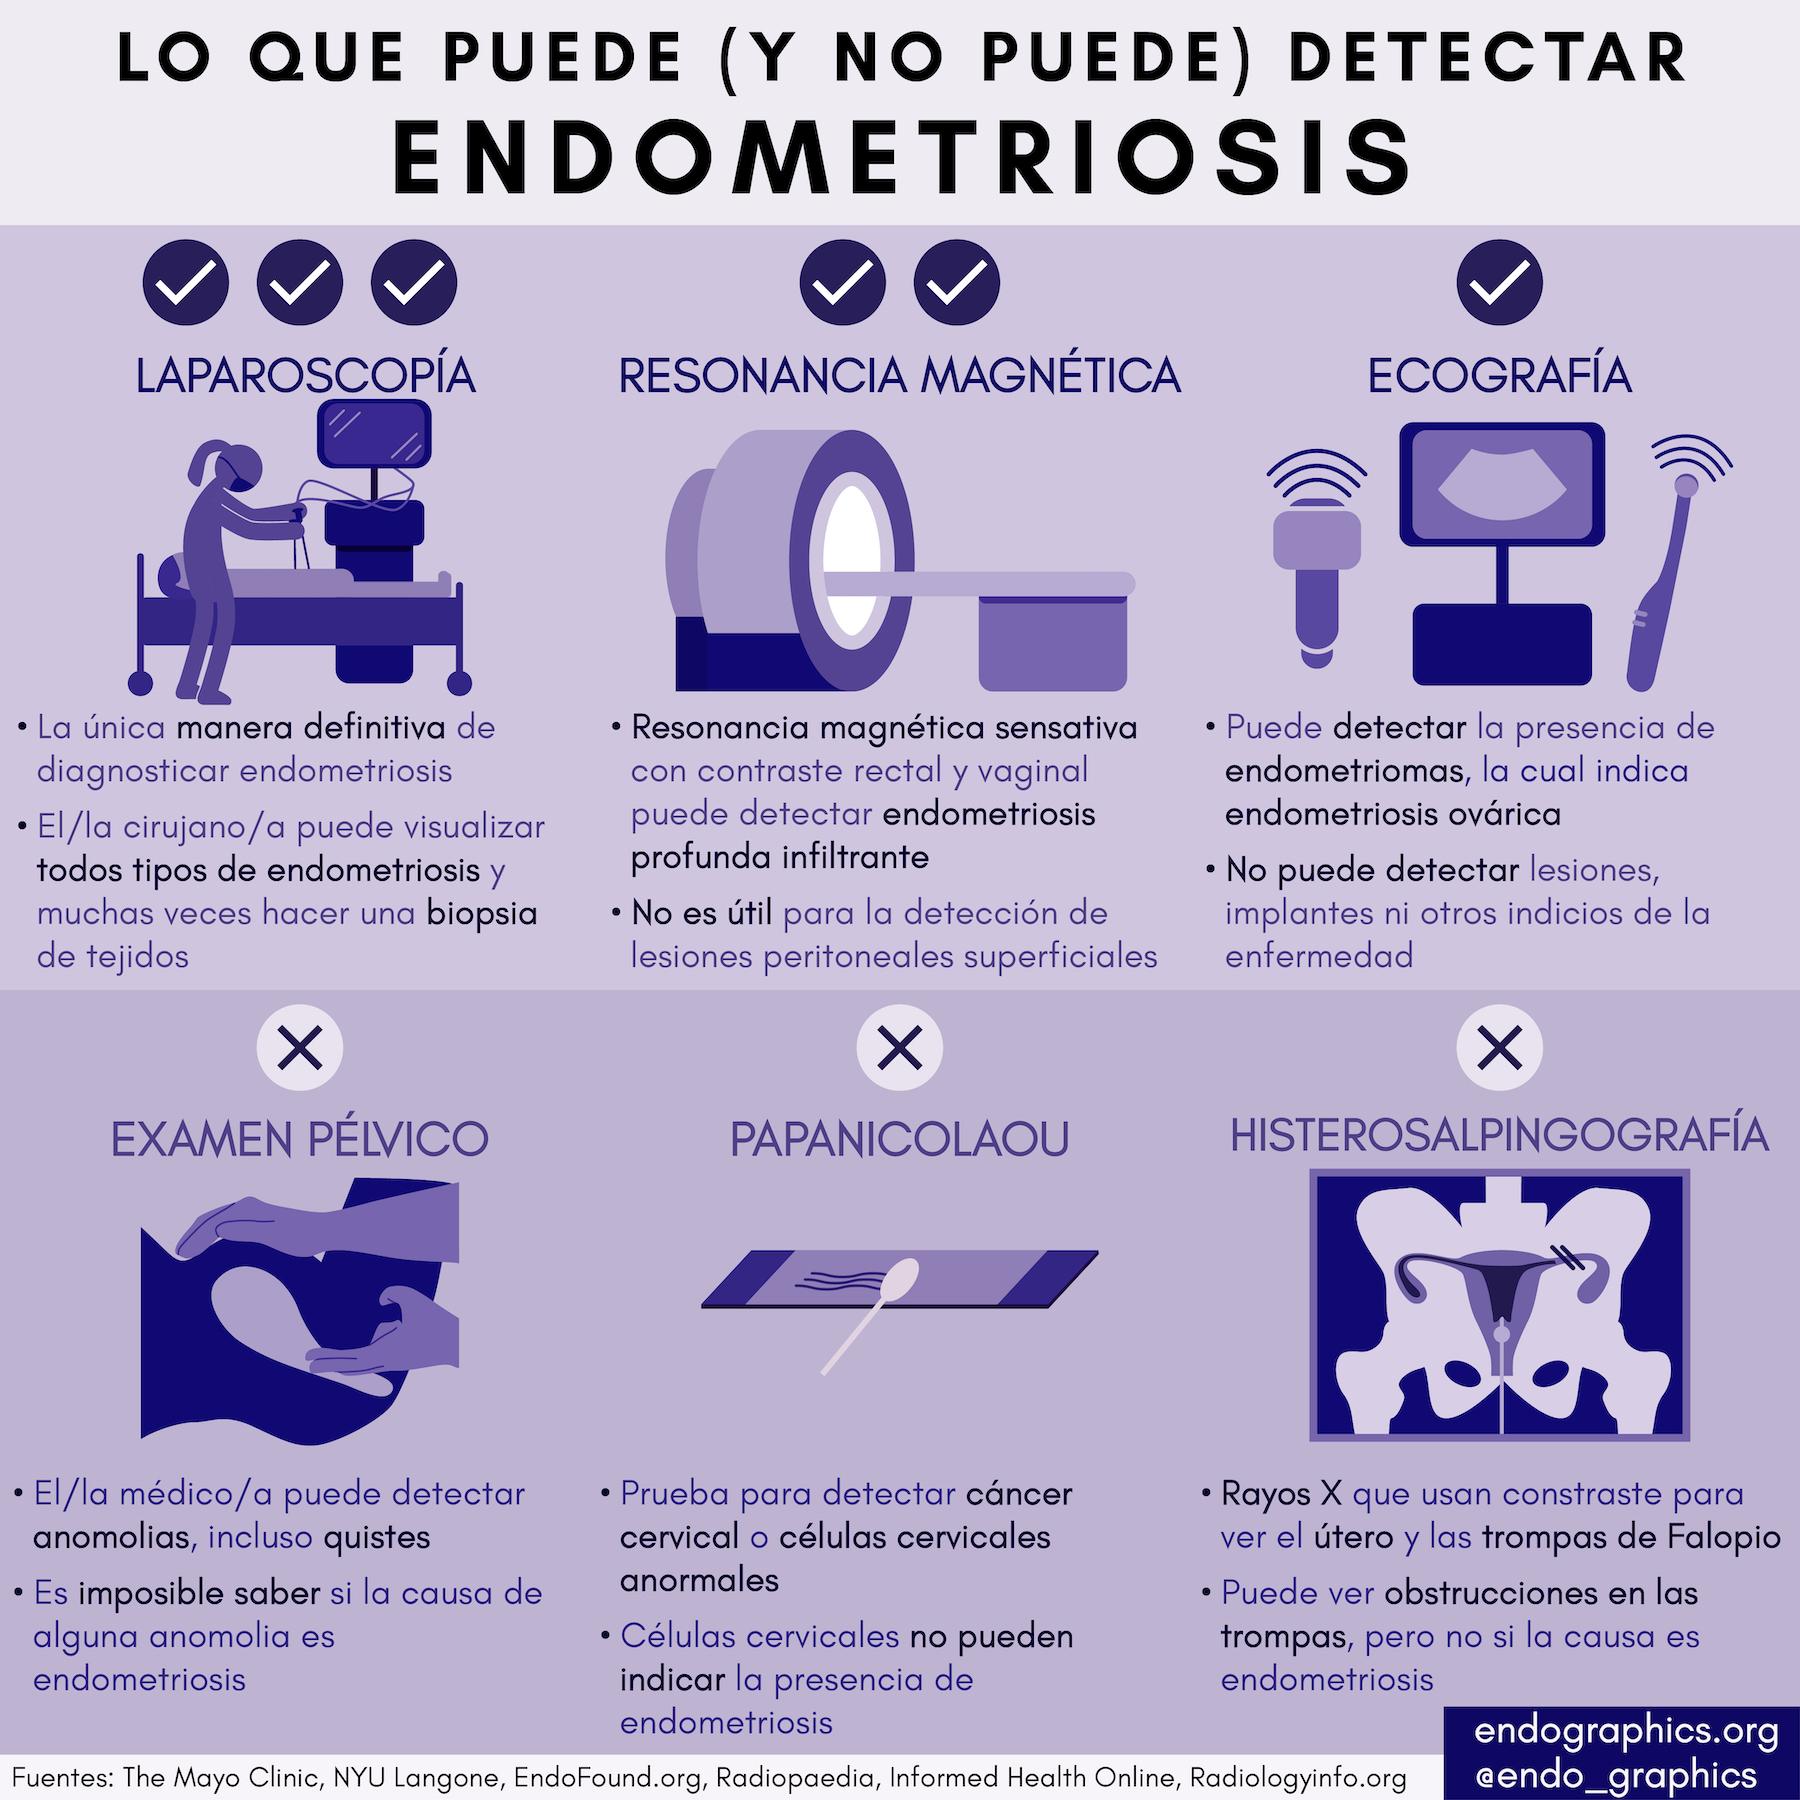 SP_What Can Detect Endometriosis MR.jpeg